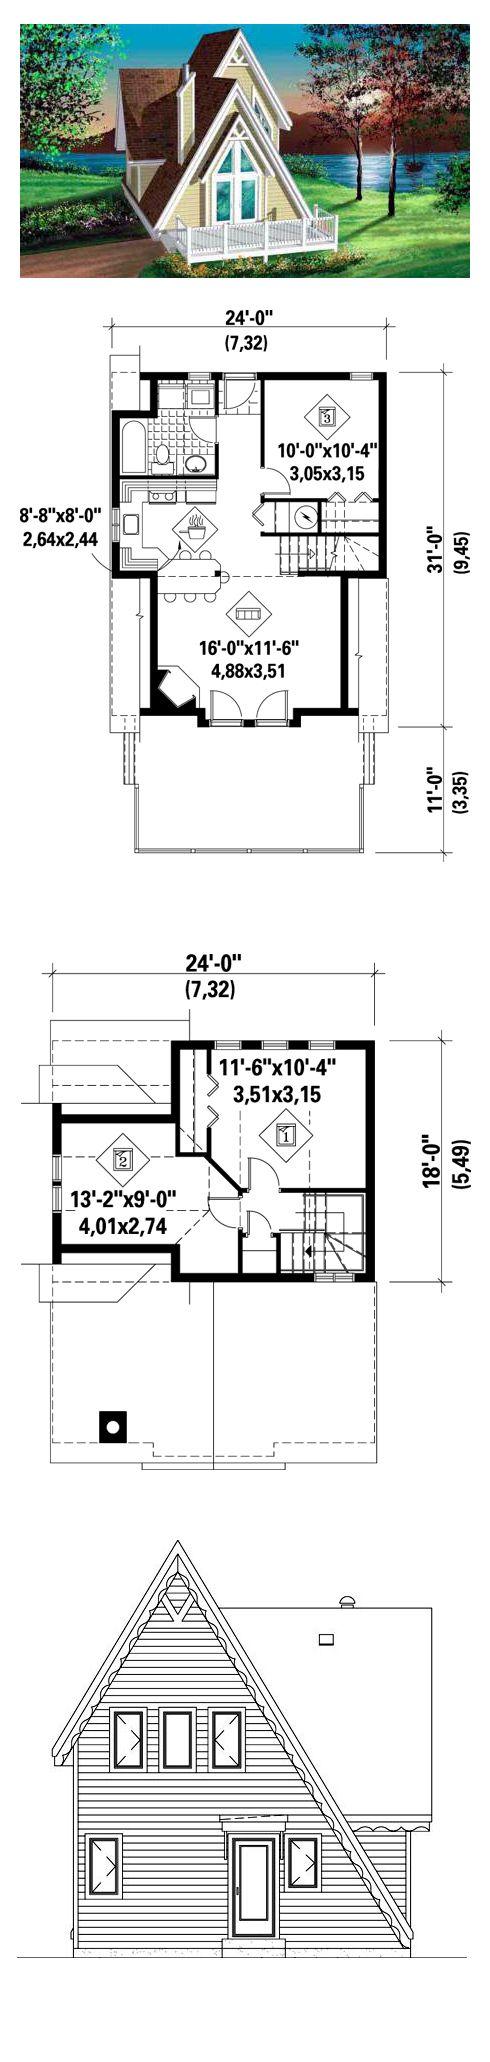 A-Frame House Plan 49303 | Total Living Area: 994 sq. ft., 3 bedrooms & 1 bathroom. #houseplan #aframe